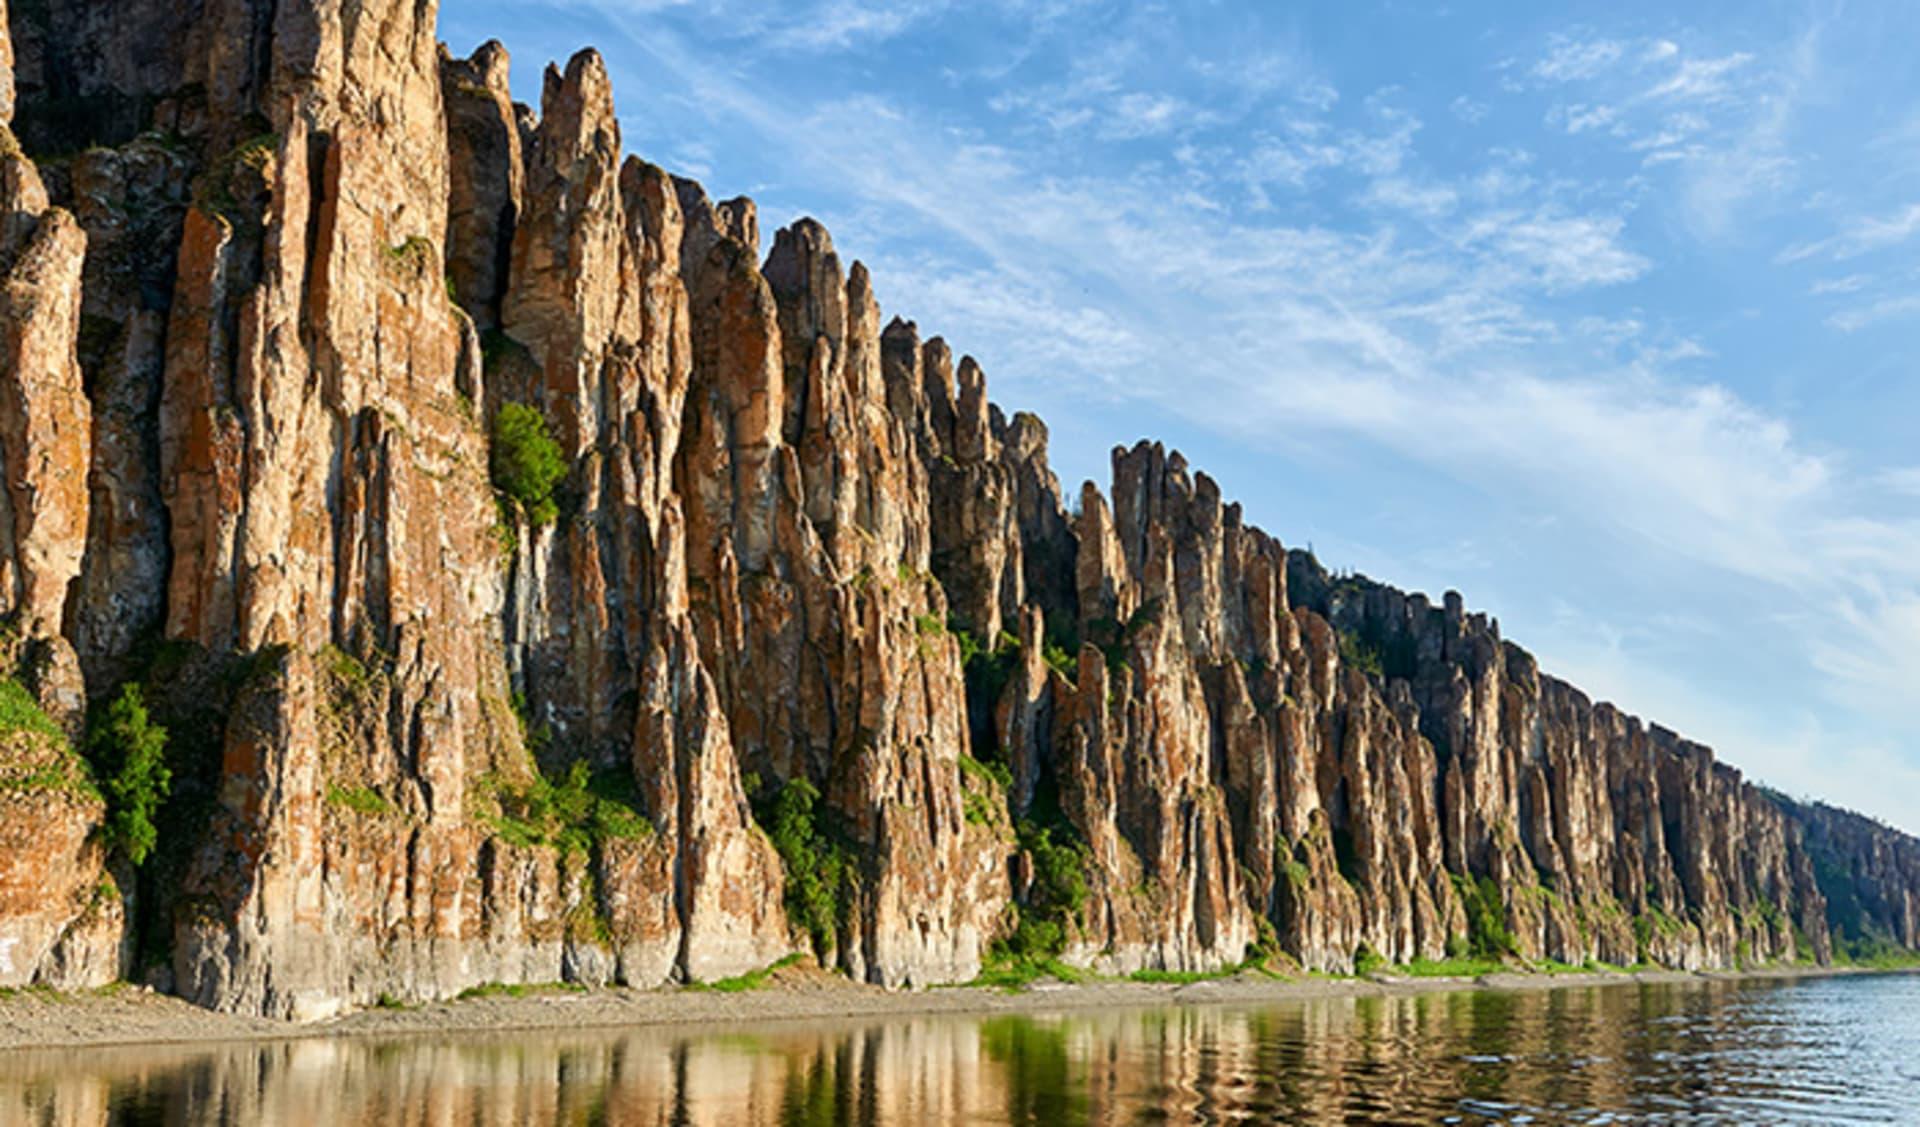 Lena Pillars, Nationalpark, Jakutia, Fluss Lena, Russland